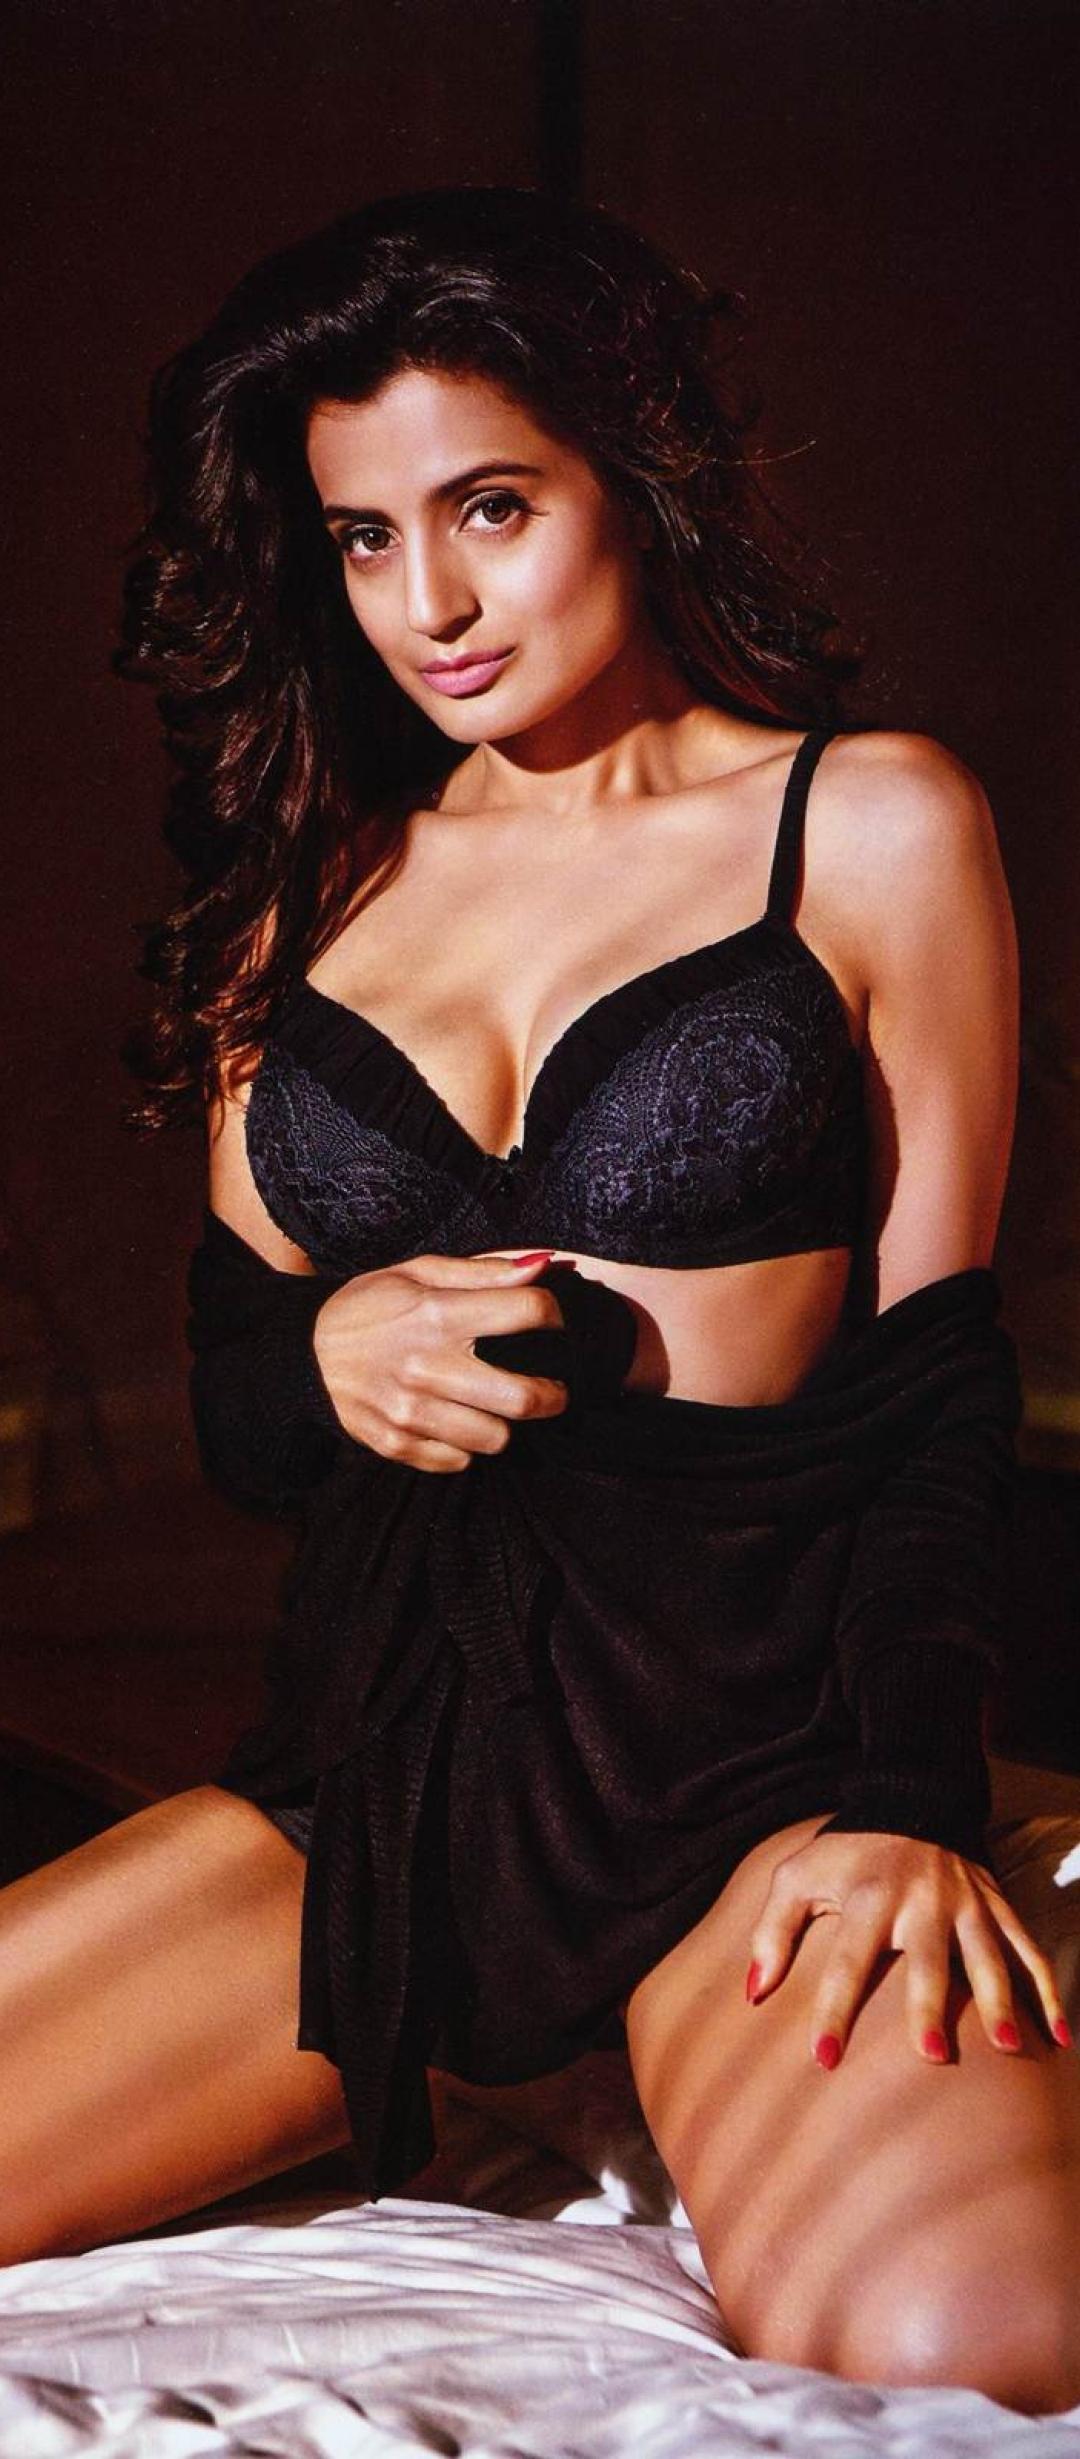 Amisha Patel Recent Photo Shoot 1080x2460 ameesha patel in maxim magazine photoshoot